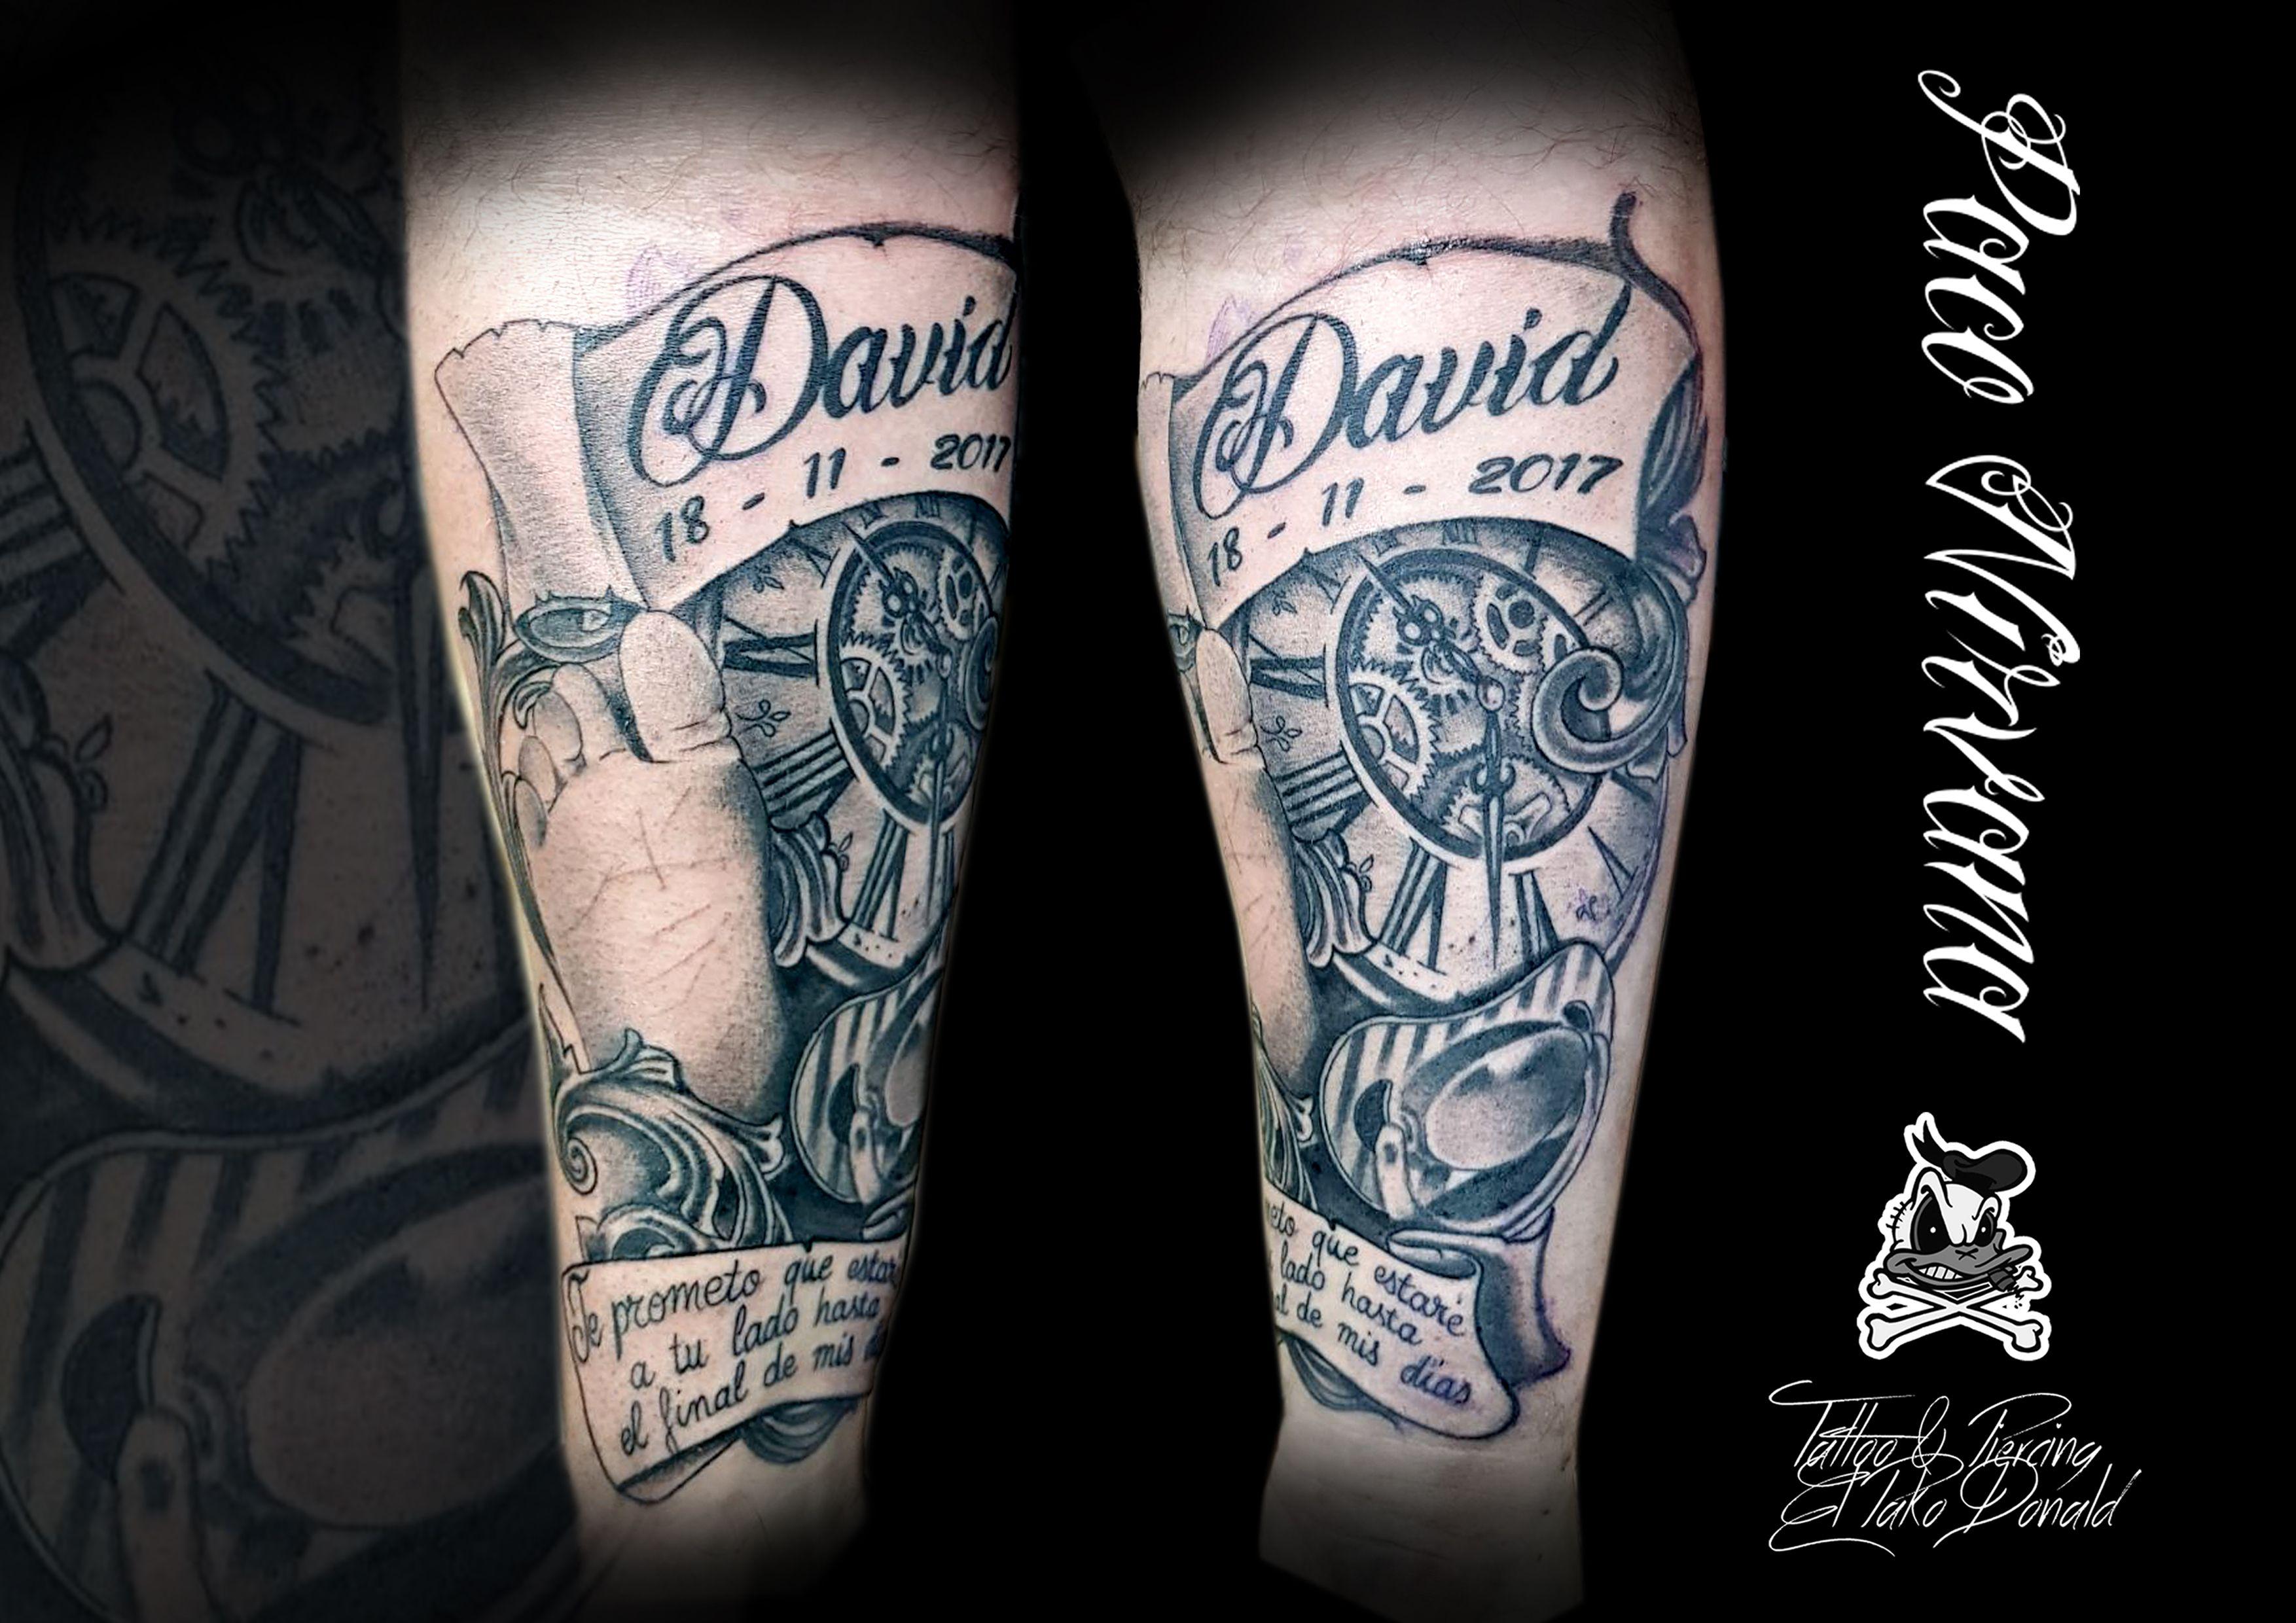 Blanco Y Negro Tatuajes De Tattoo Piercing El Pako Donald